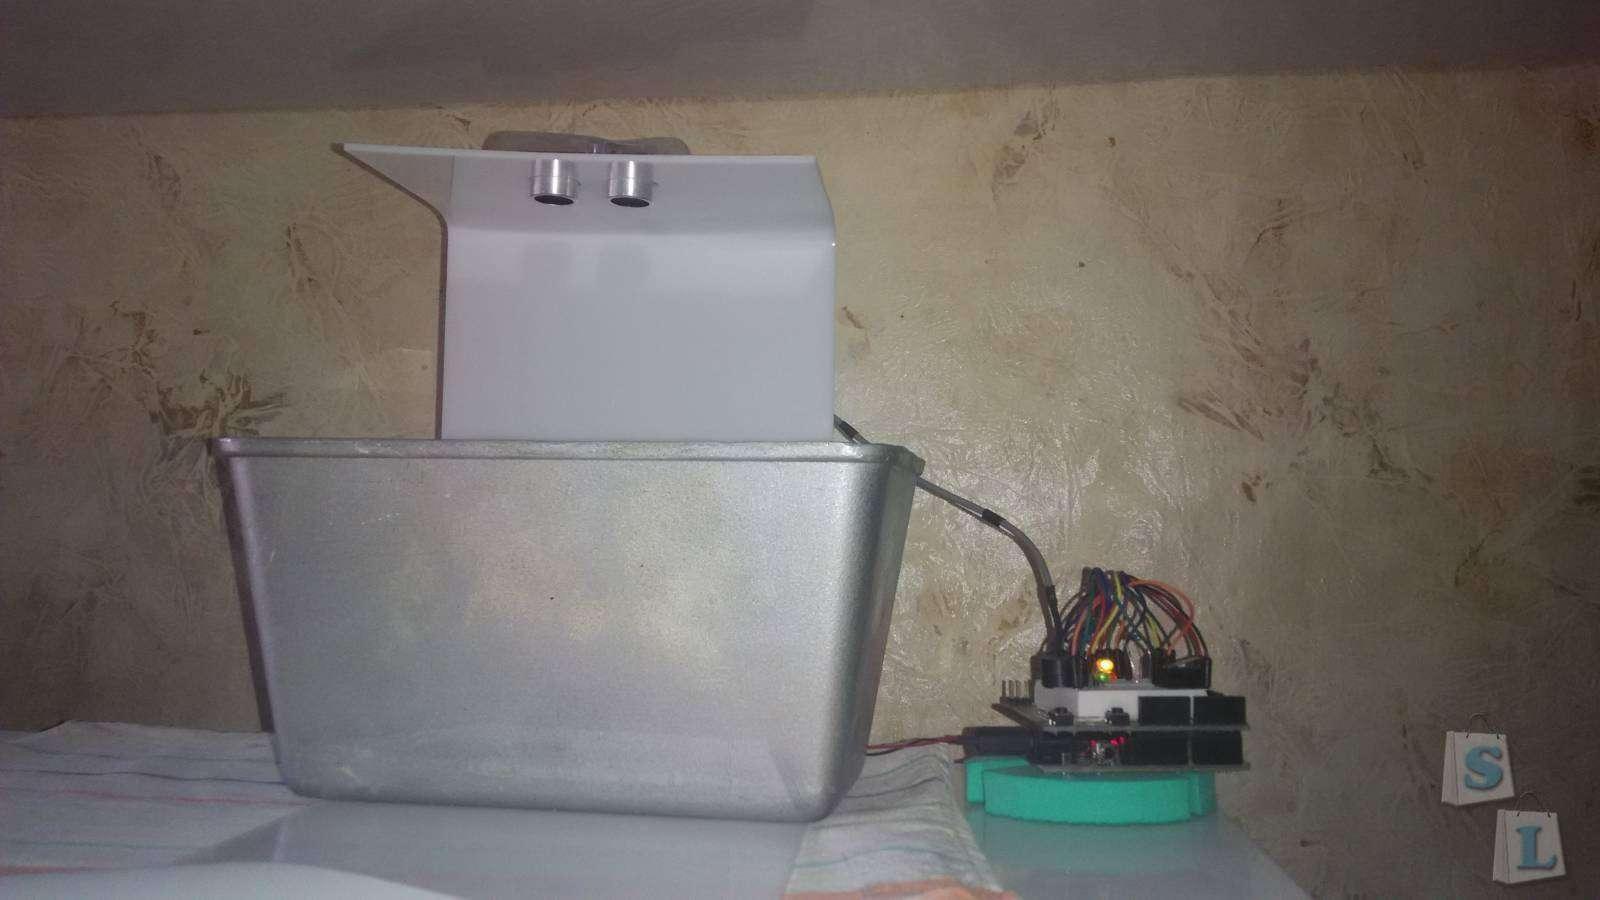 Ebay: Ультразвуковой датчик HC-SR04: А у вас тесто убежало ;)